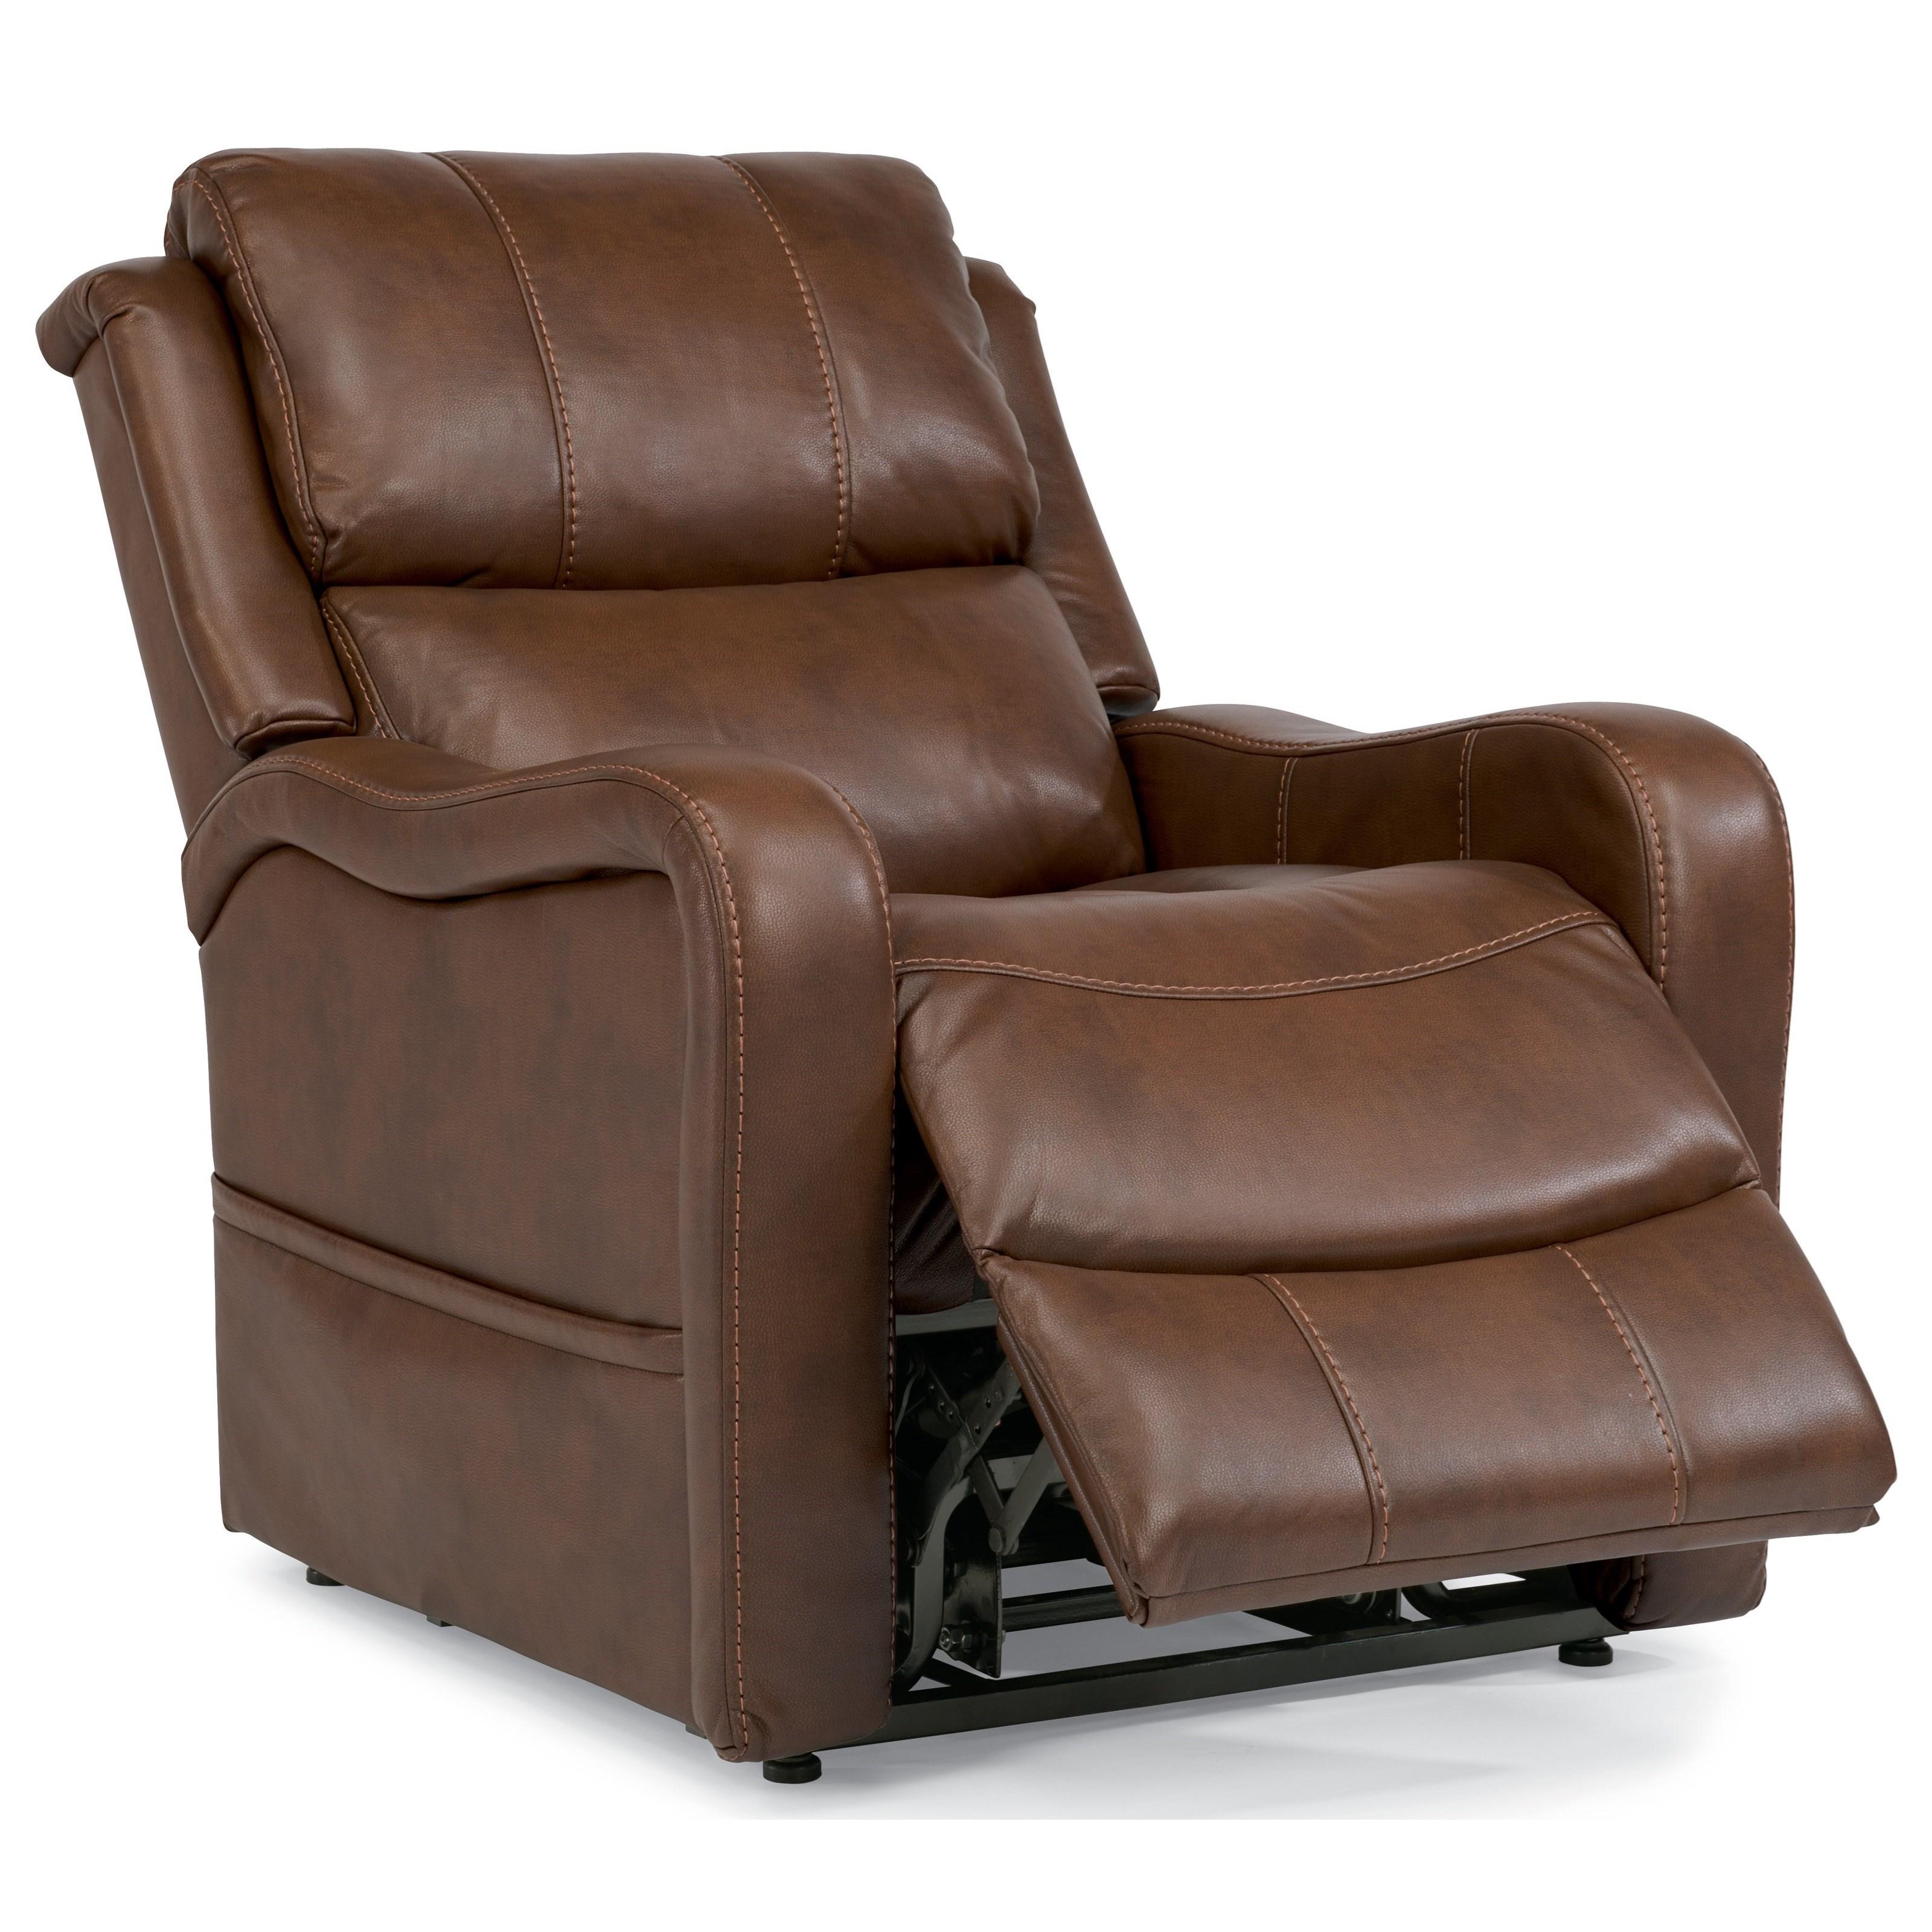 flexsteel latitudes lift chairs bailey threeway power lift recliner